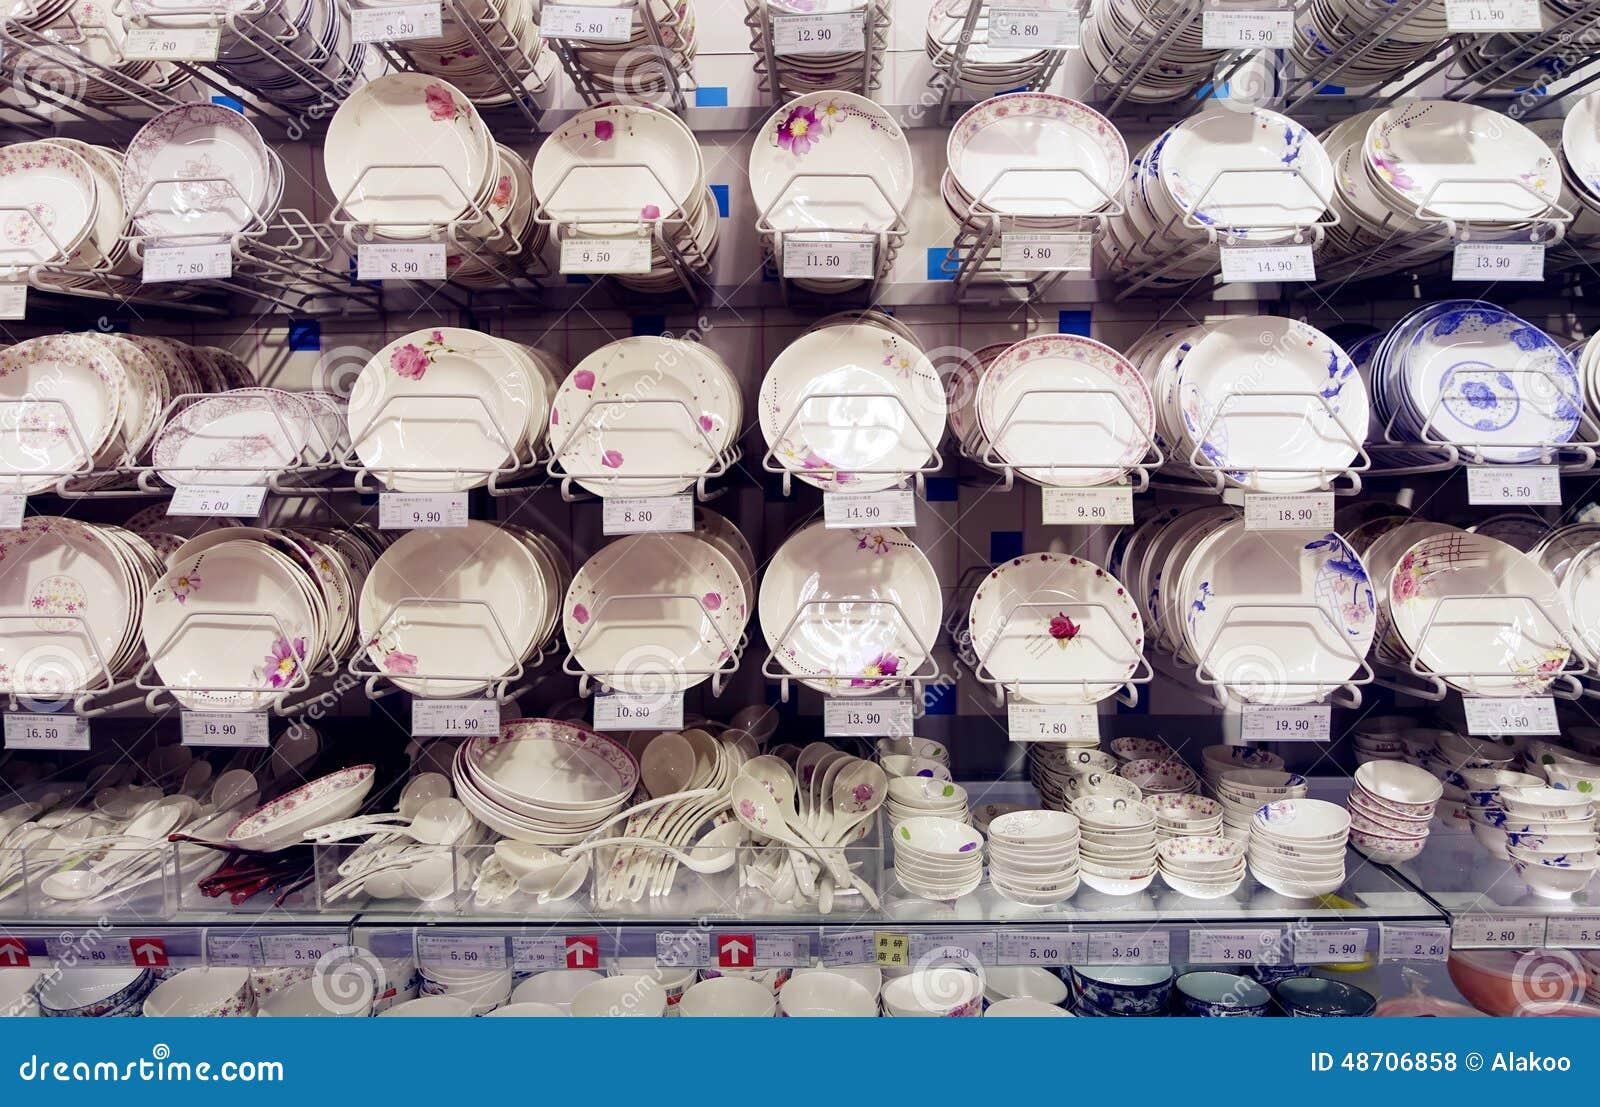 dishes retail shop supermarket store